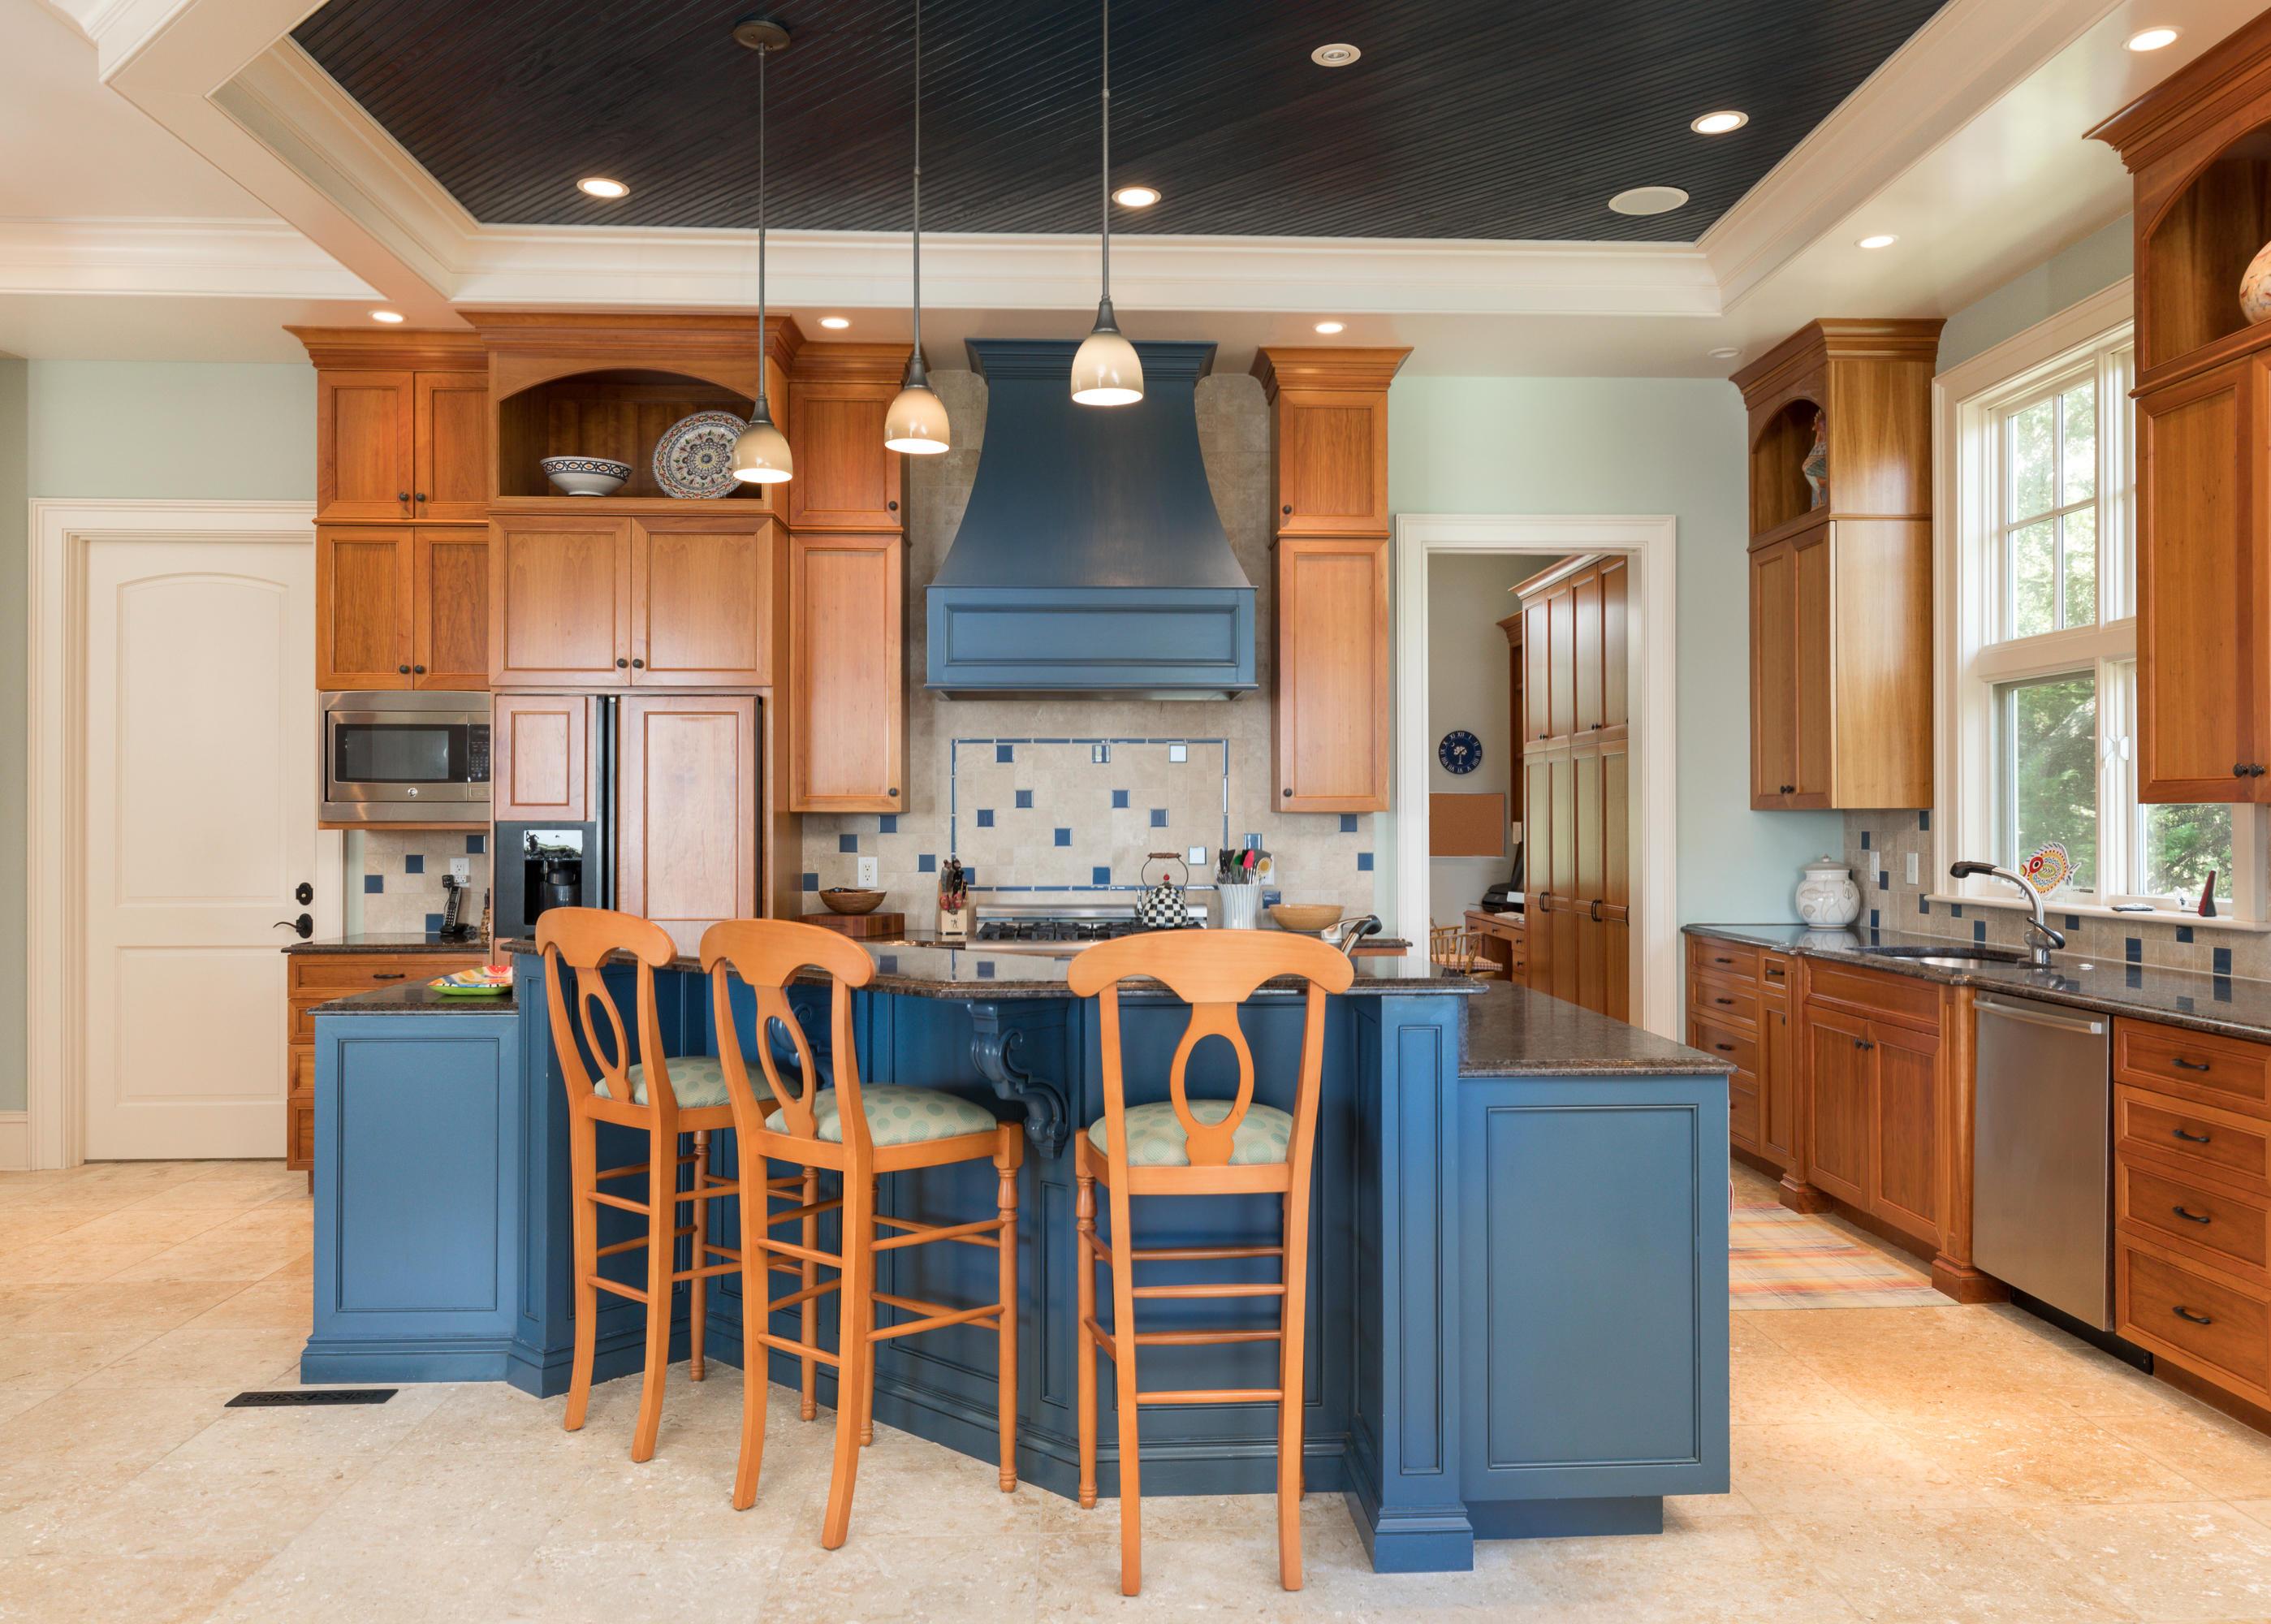 Seabrook Island Homes For Sale - 3033 Marshgate, Johns Island, SC - 30